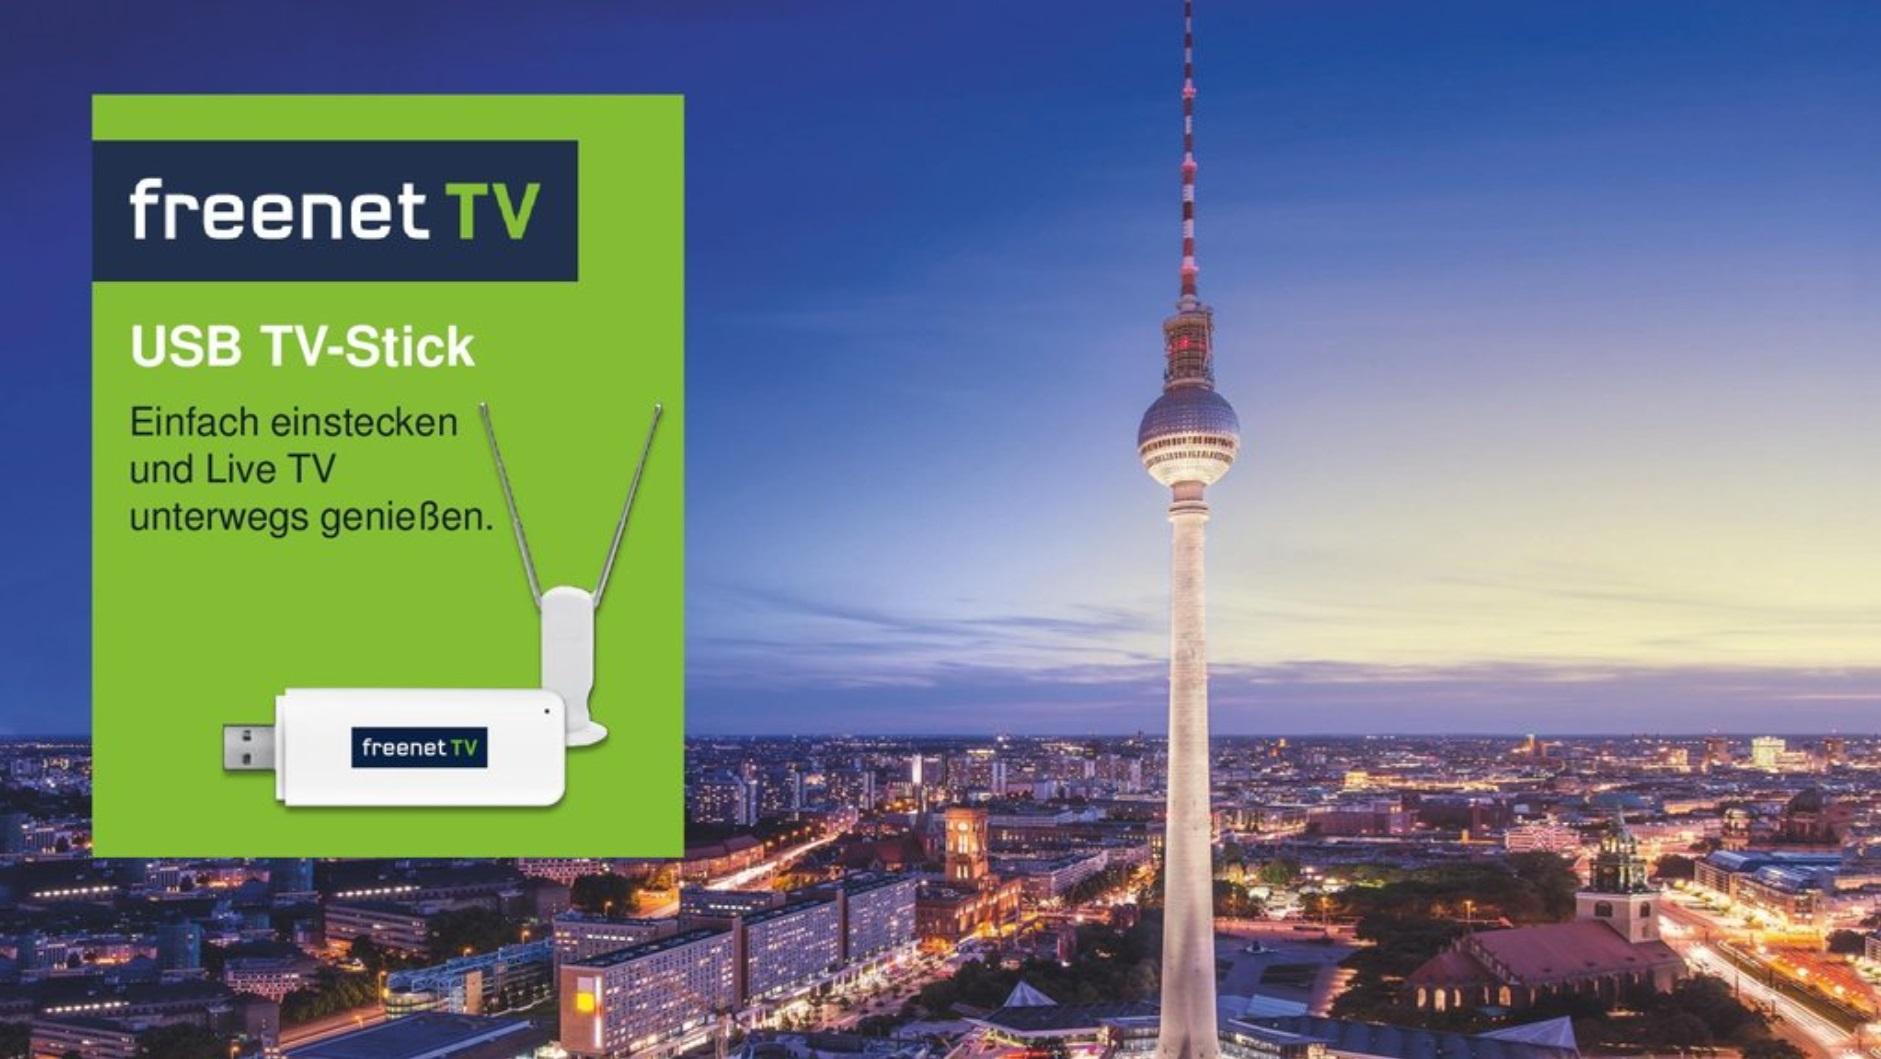 freenet TV USB TV-Stick